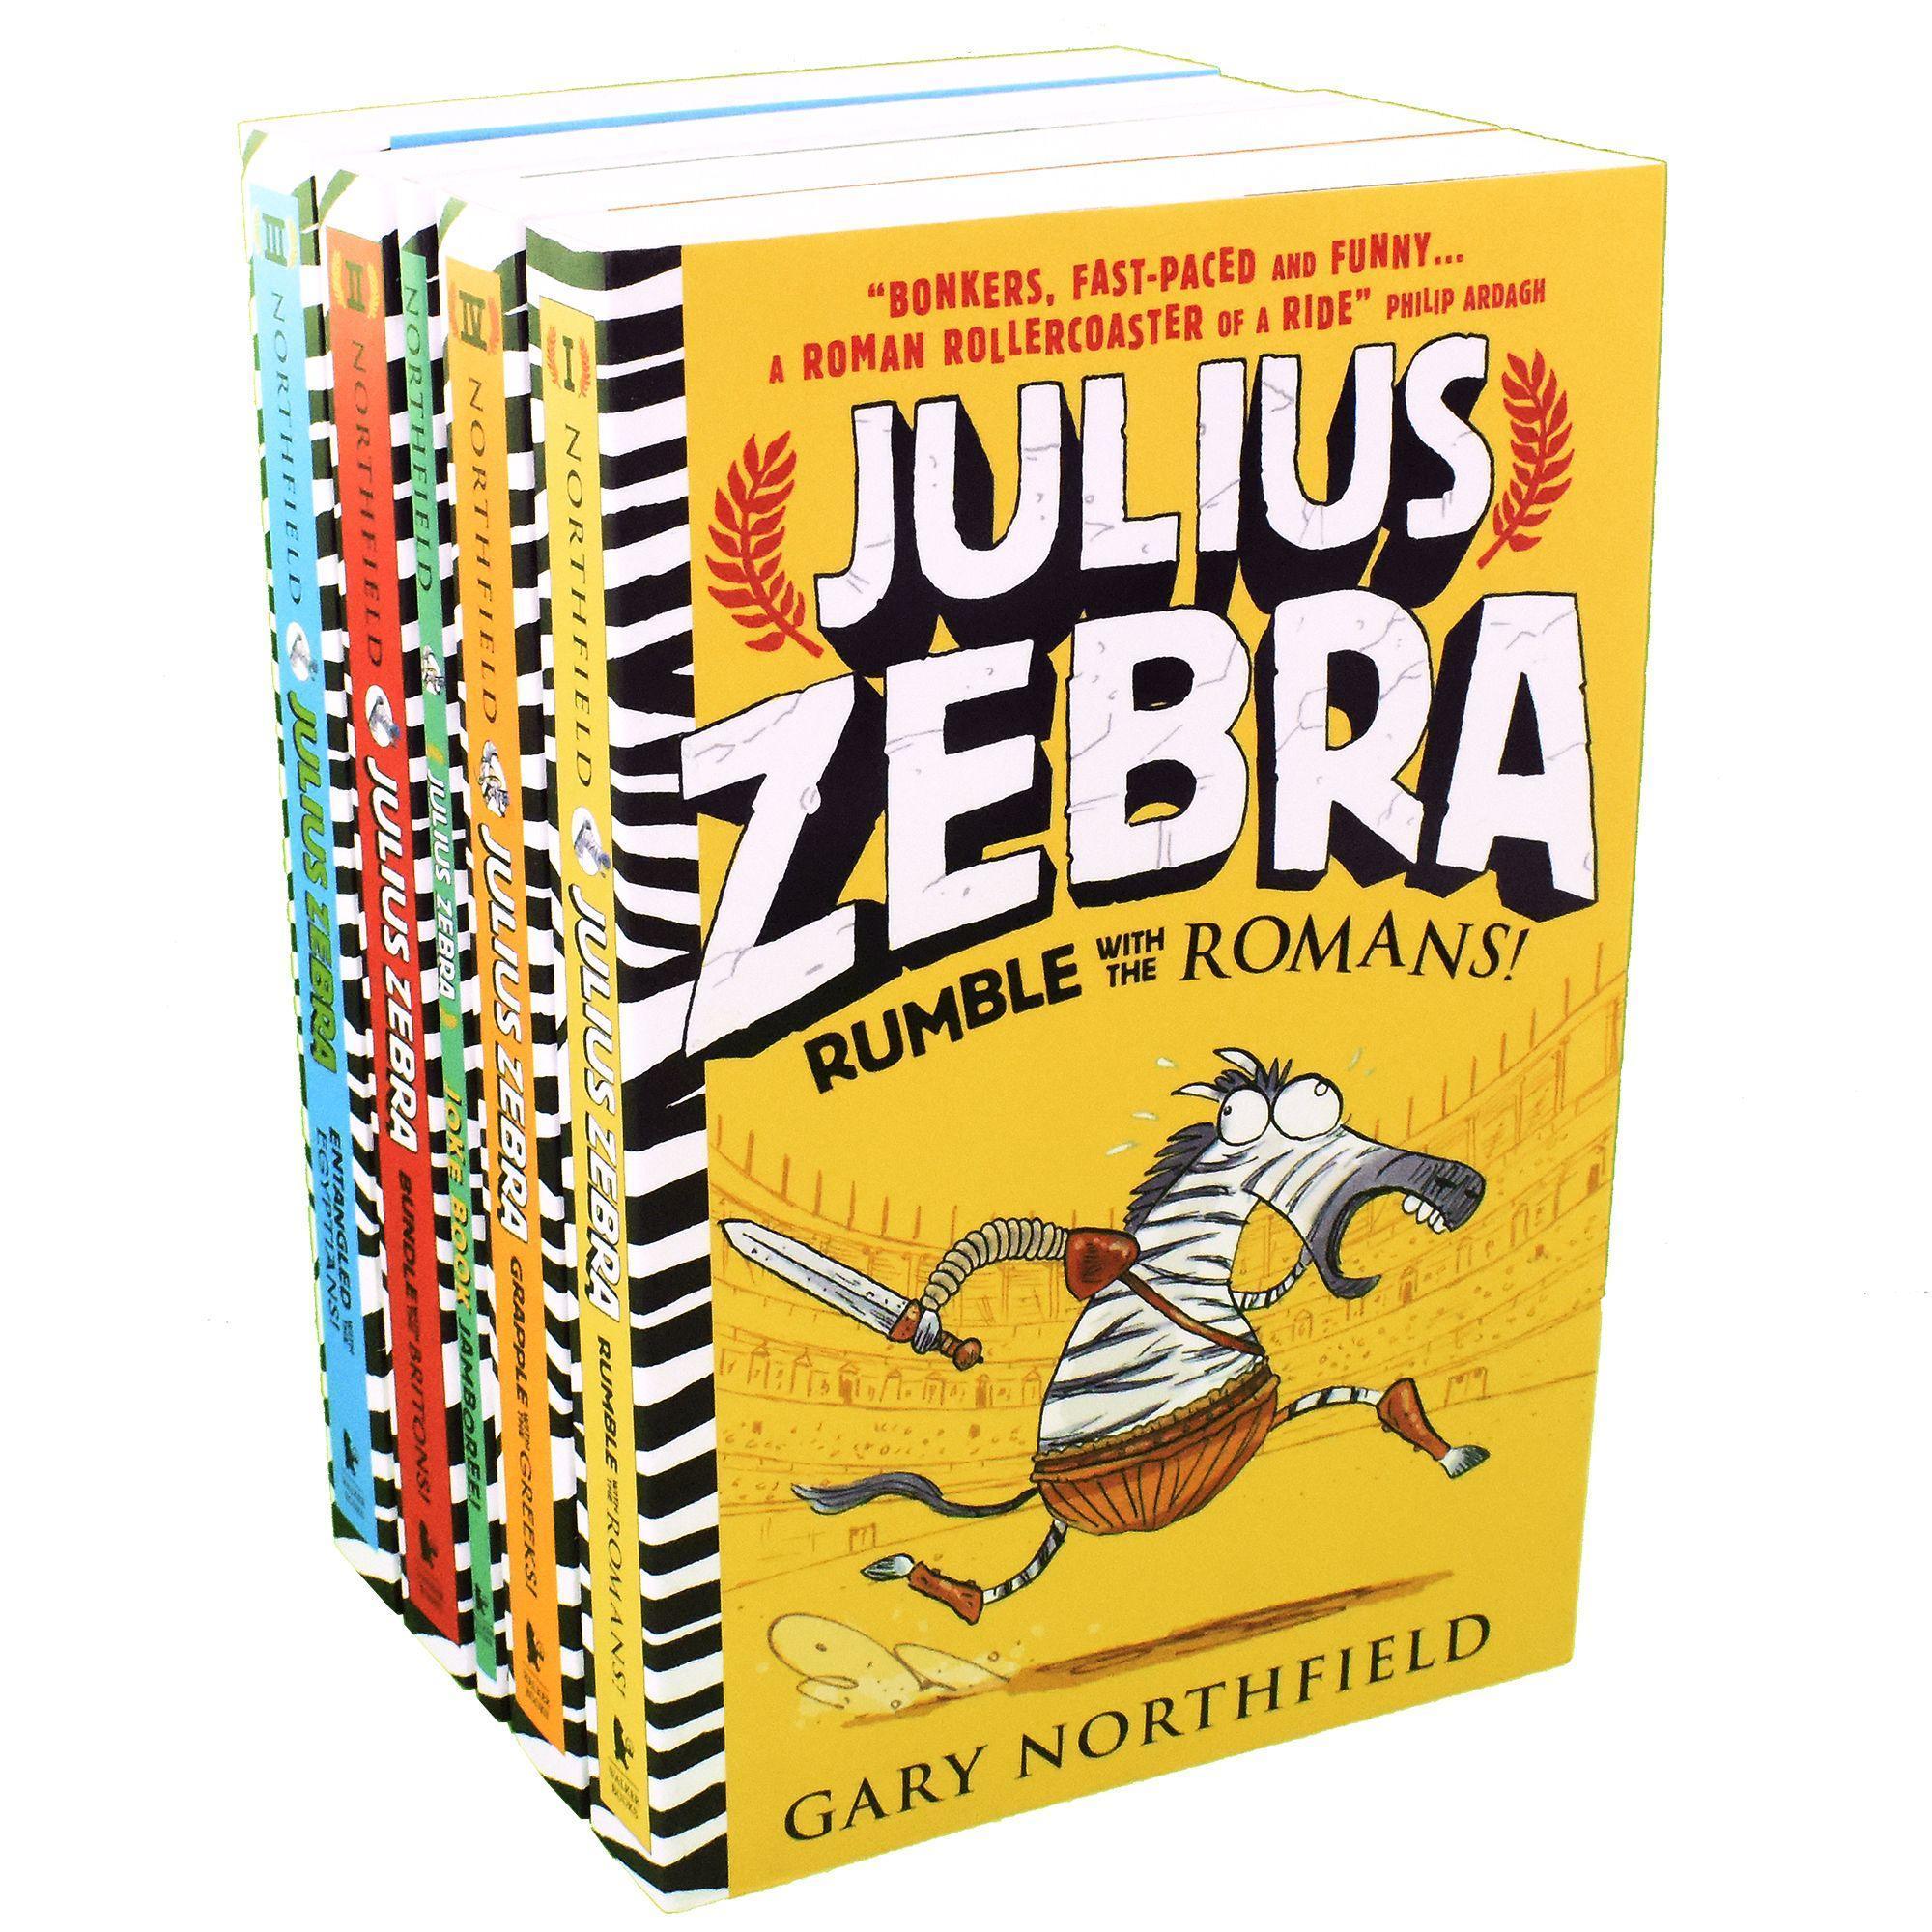 Walker Books Julius Zebra 5 Kids Books Children Collection by Gary Northfield - Ages 7-9 - Paperback